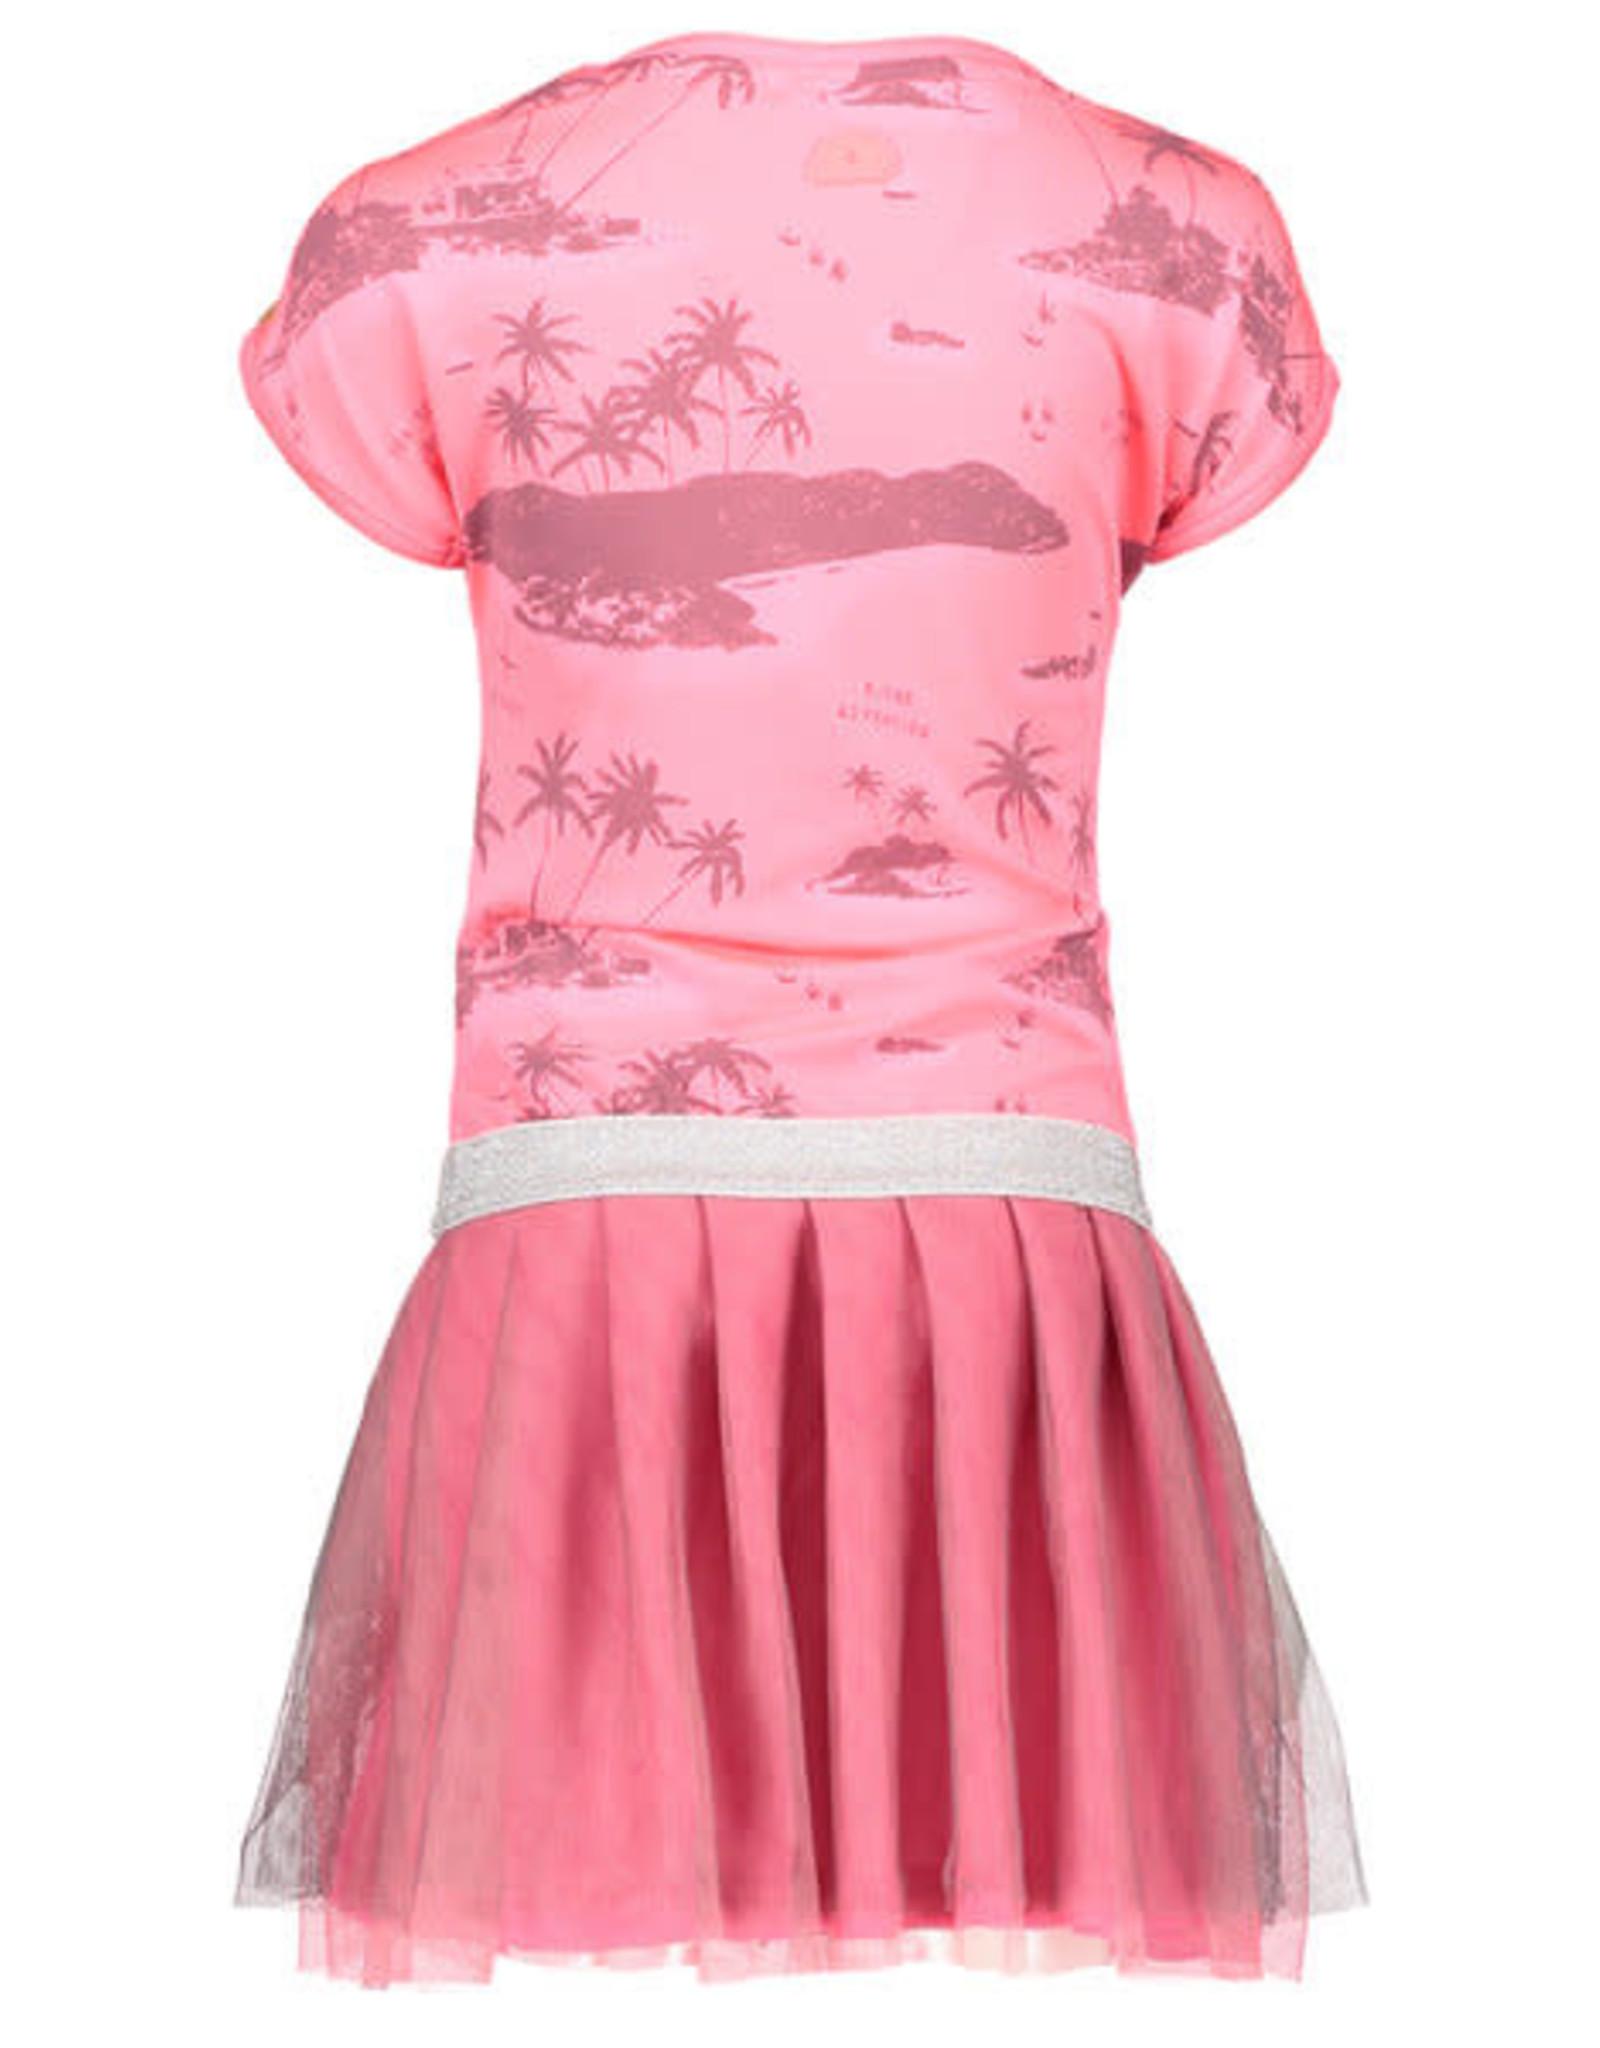 B. Nosy Girls jersey aloha dress with double layer netting